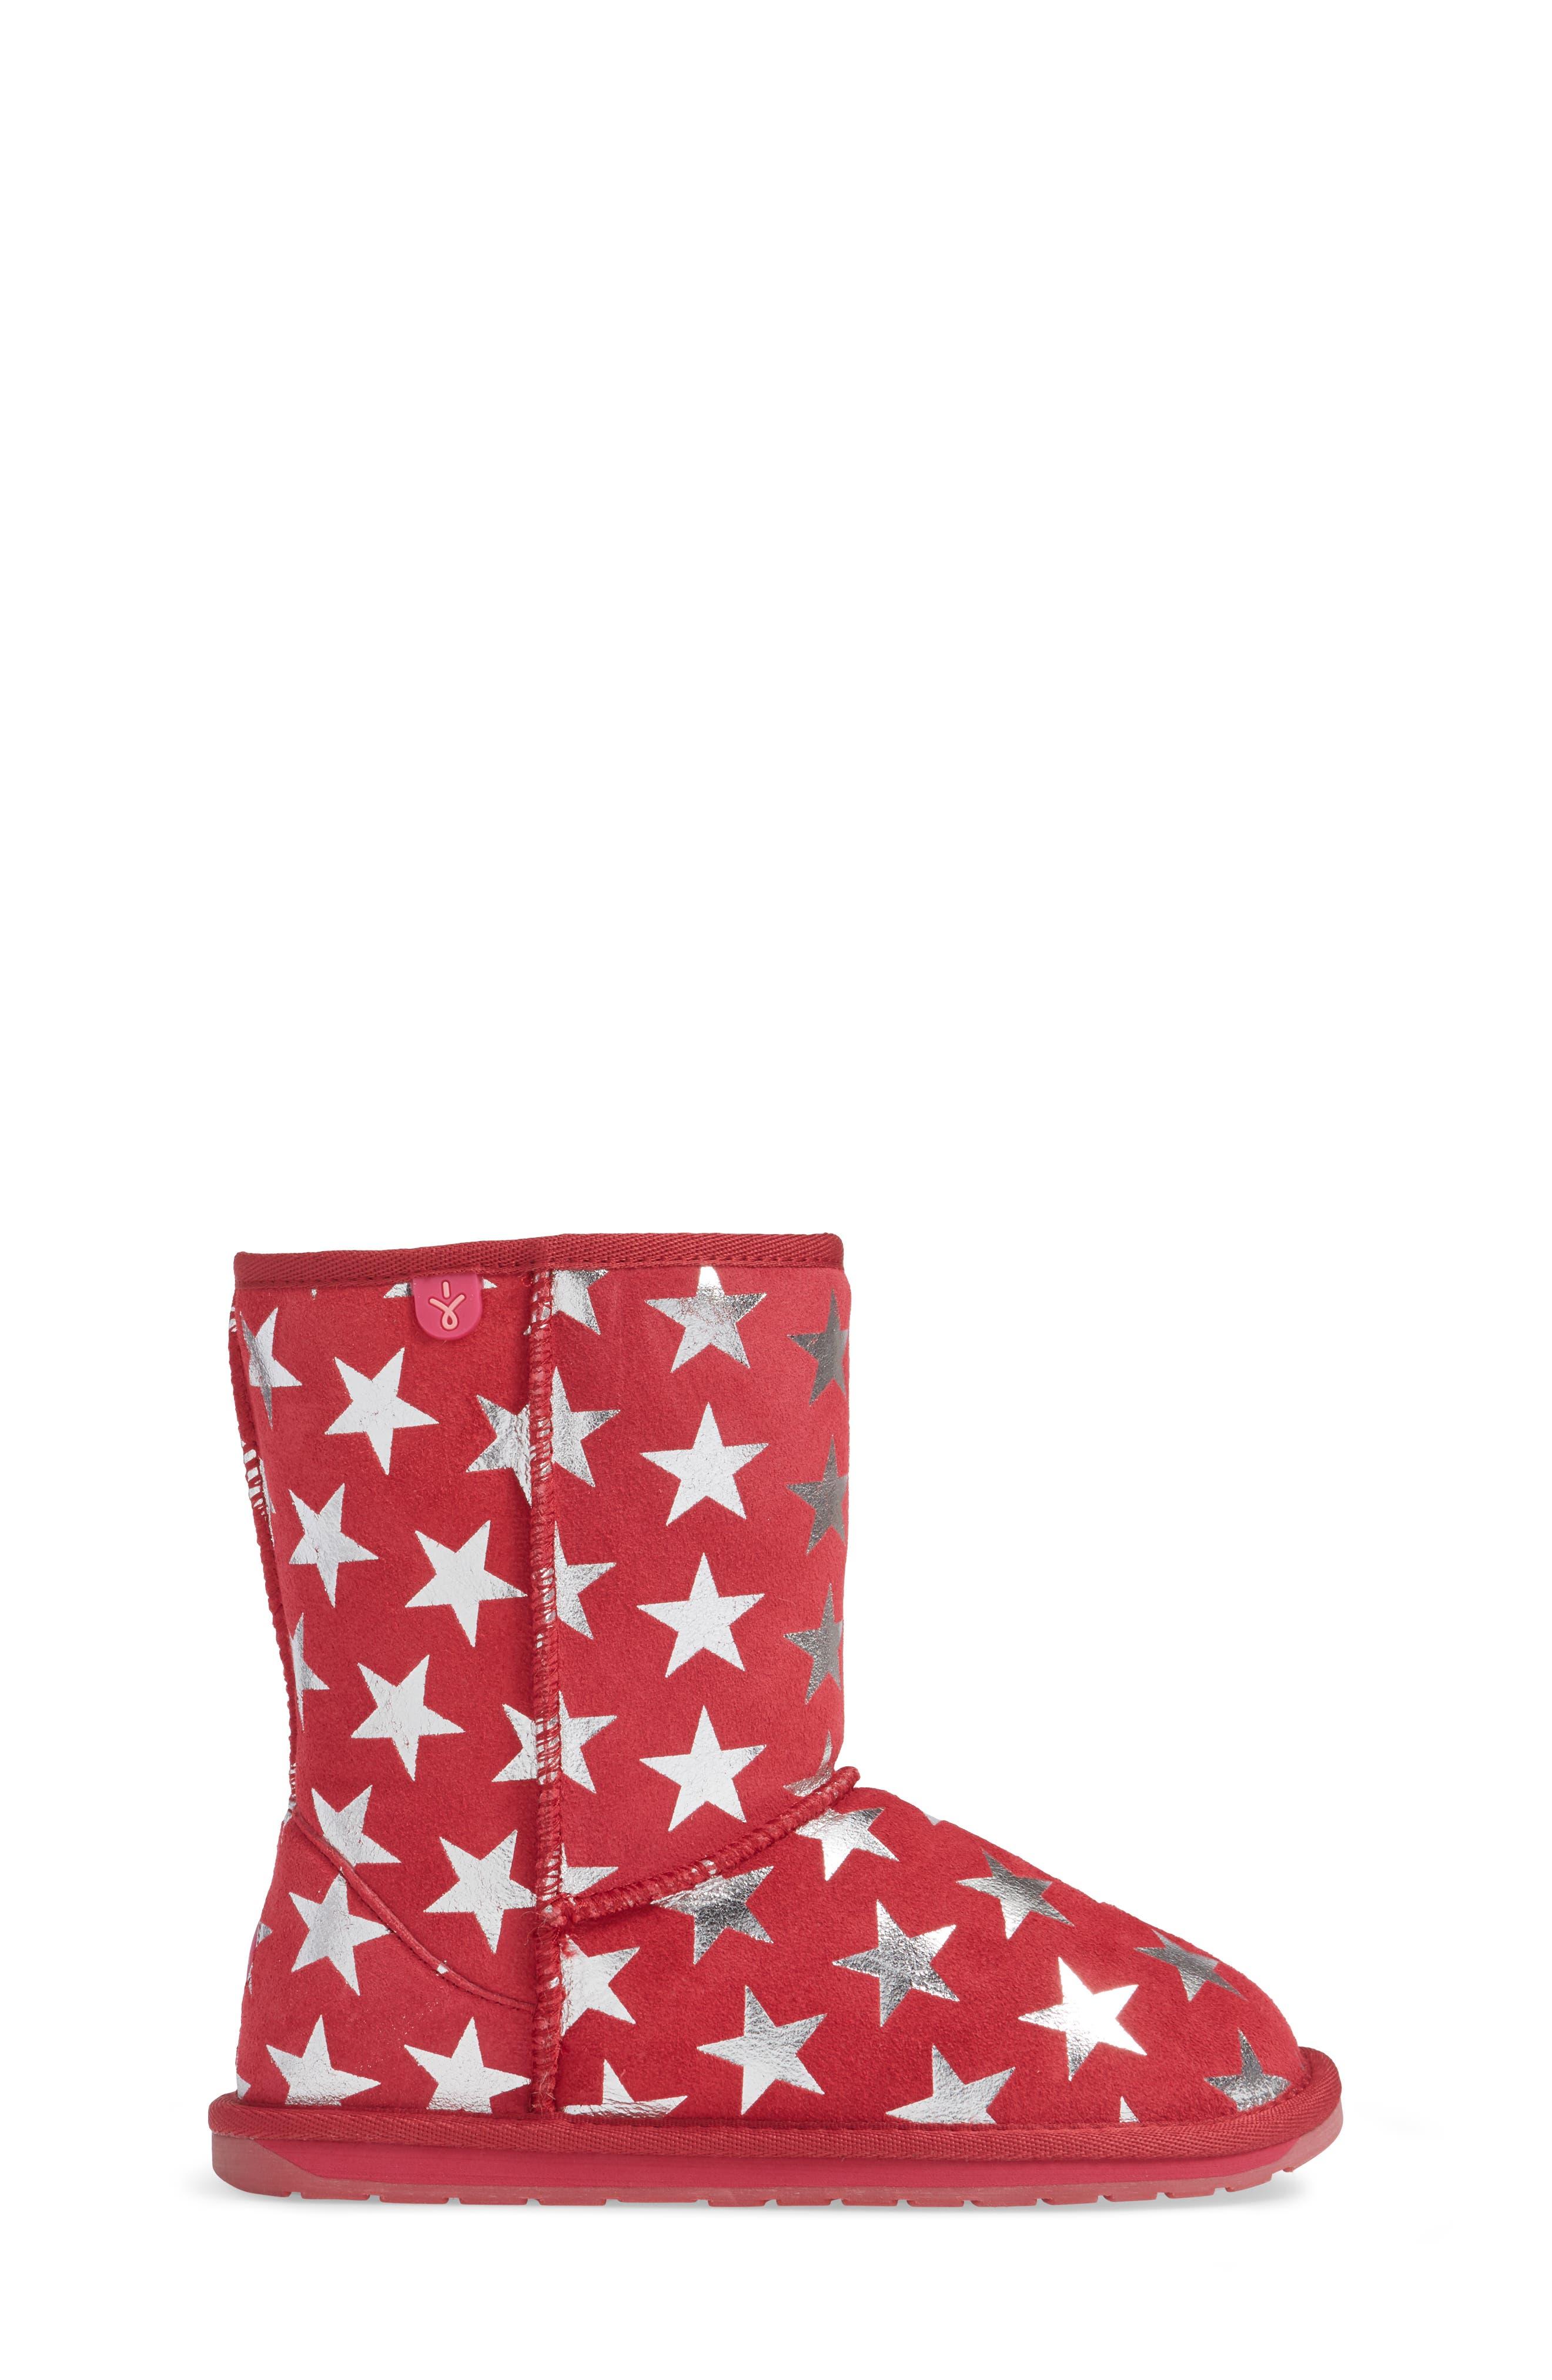 EMUAustralia Starry Night Boot,                             Alternate thumbnail 3, color,                             Fuchsia